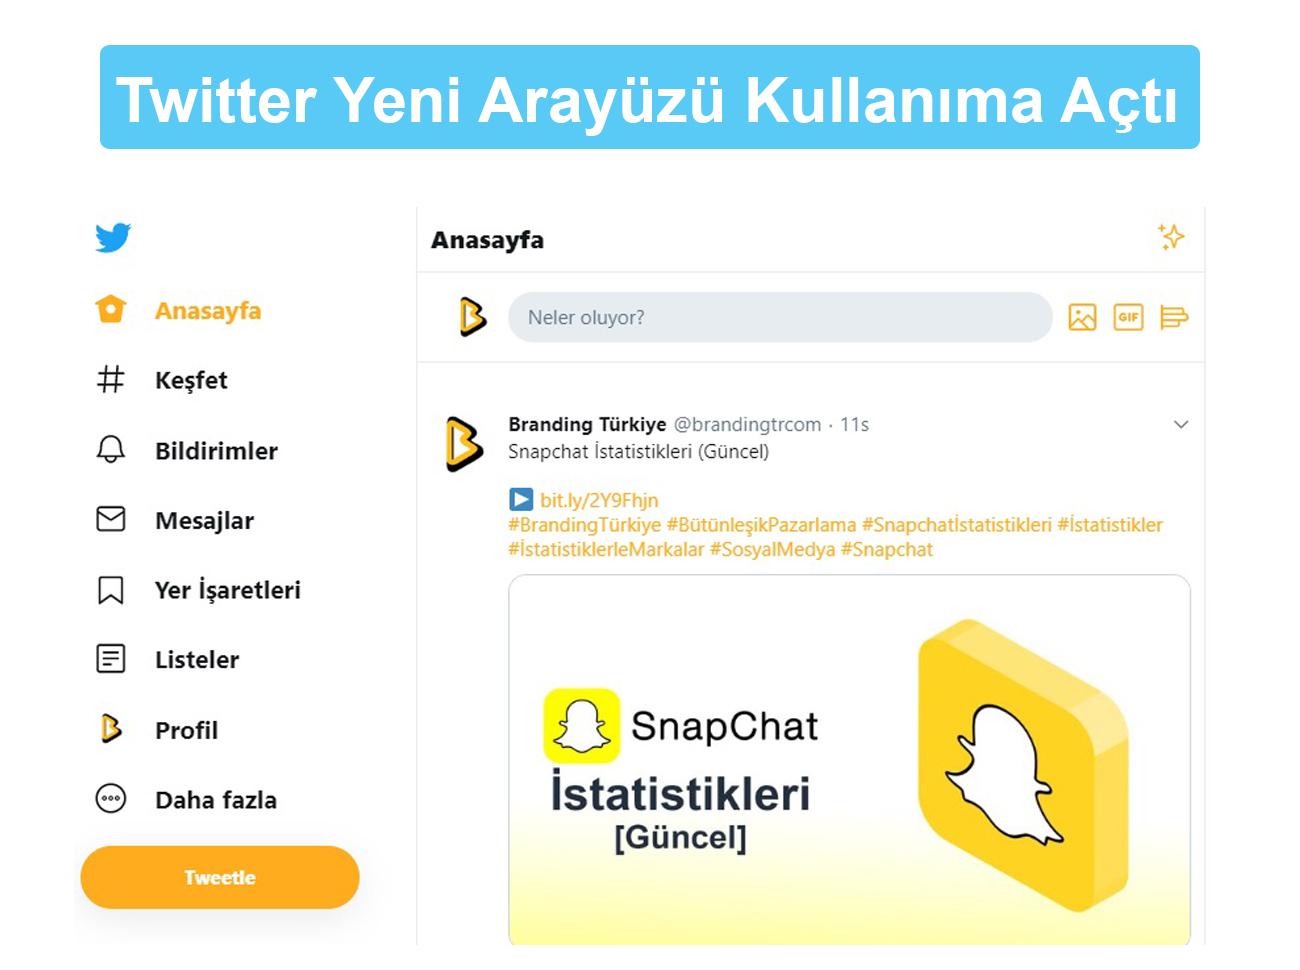 Twitter Yeni Arayüzü